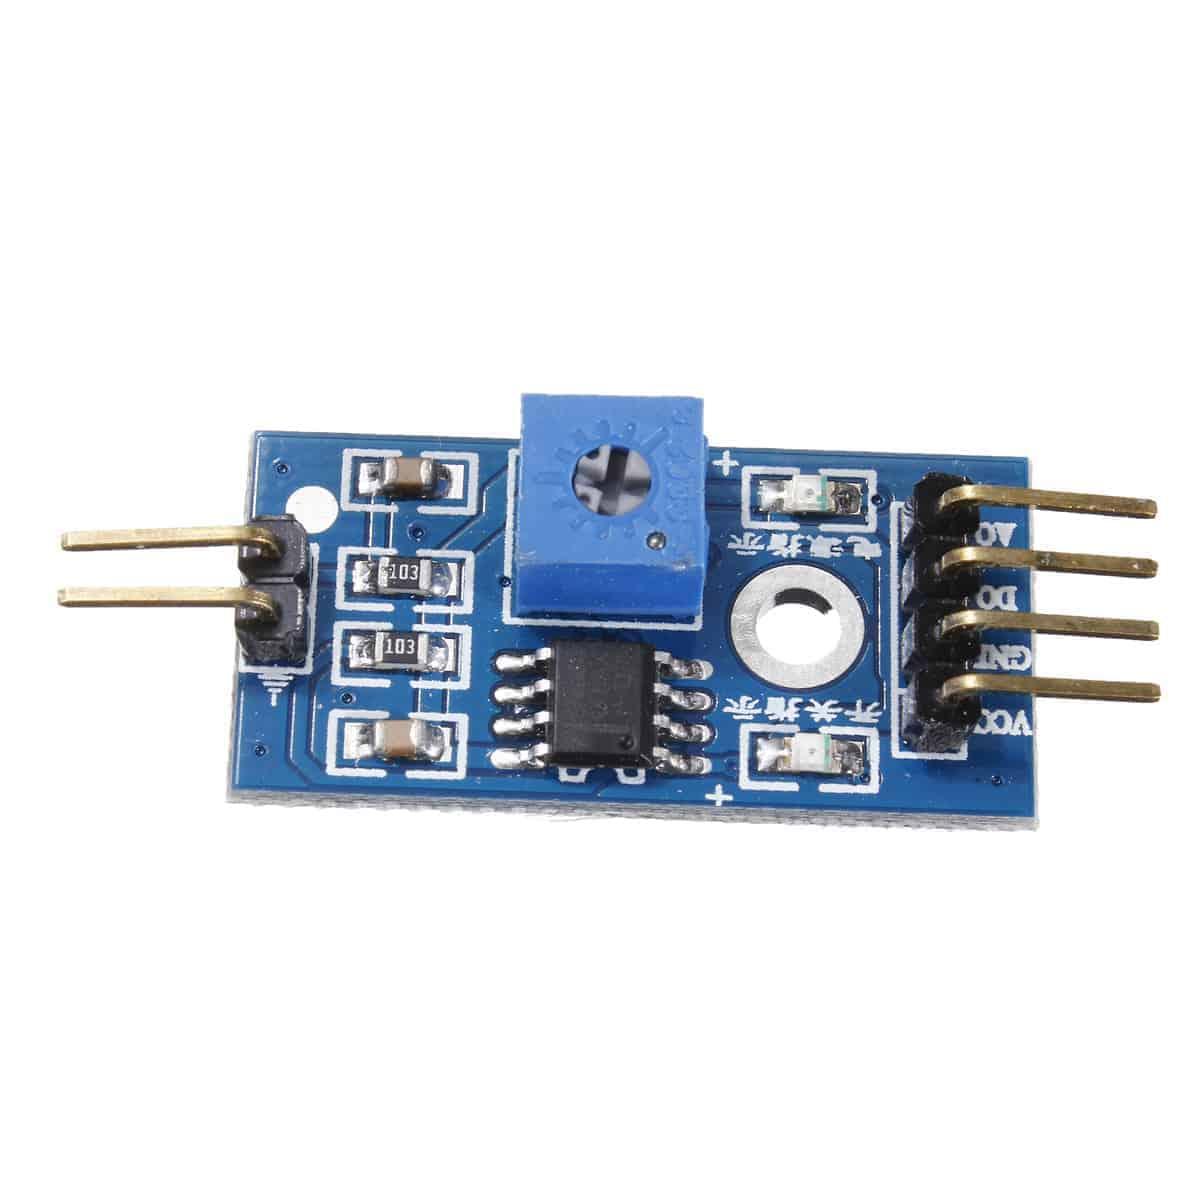 Raindrop Detection Sensor Module Humidity Rain Drop For Arduino PI #325C99